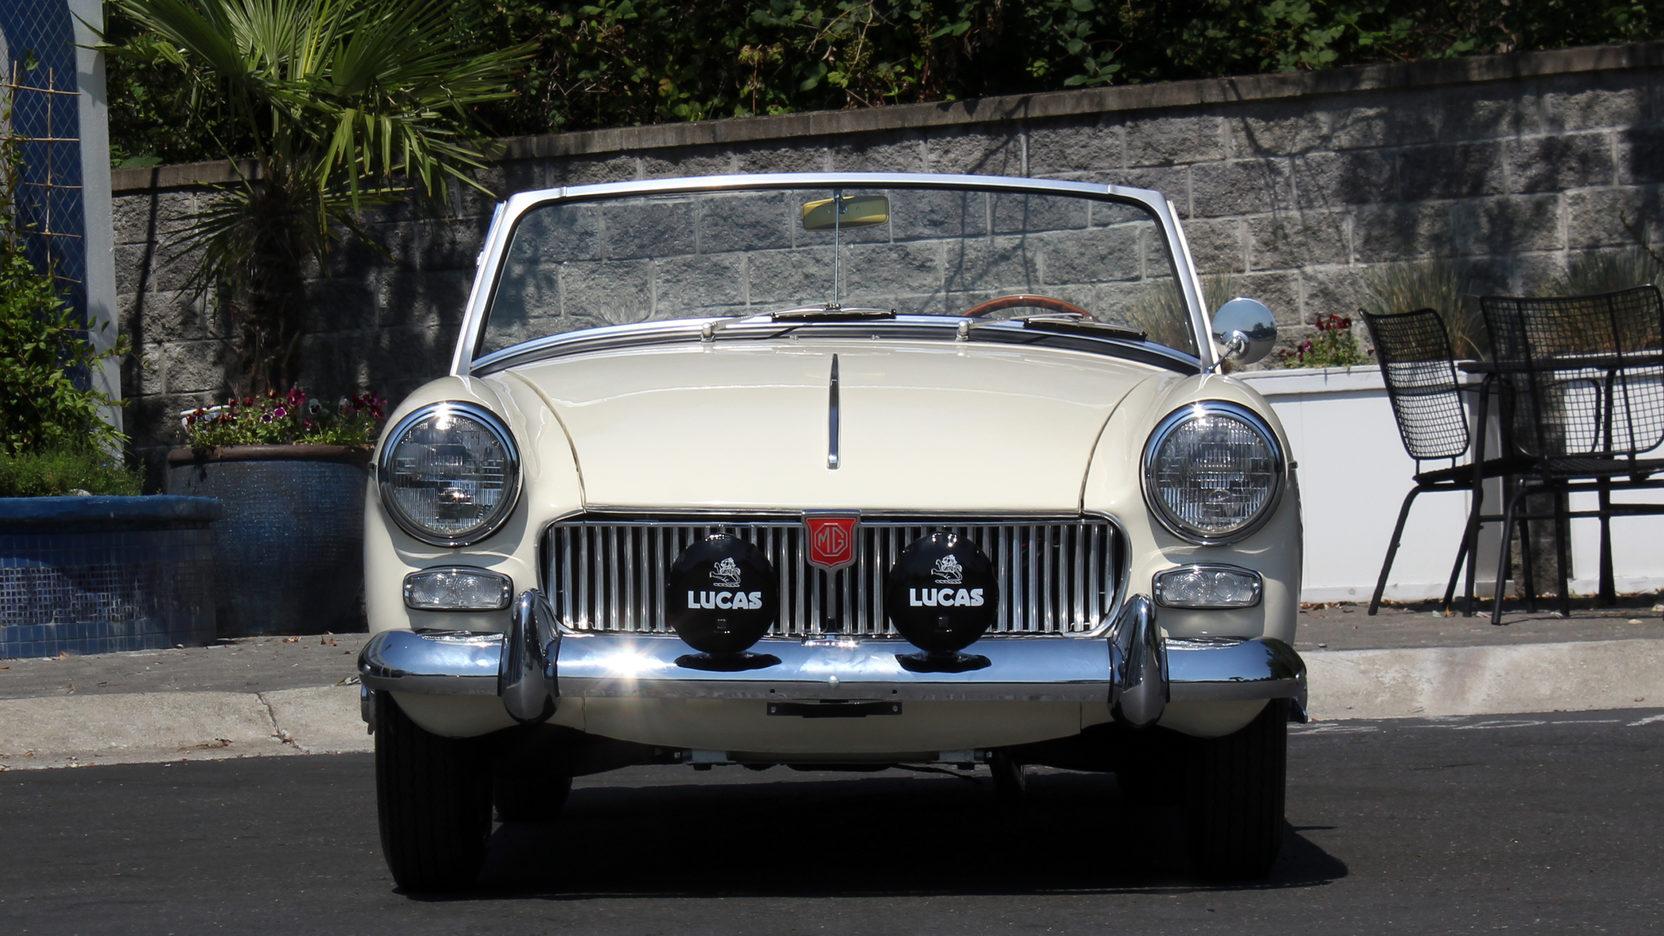 1965 MG Midget front